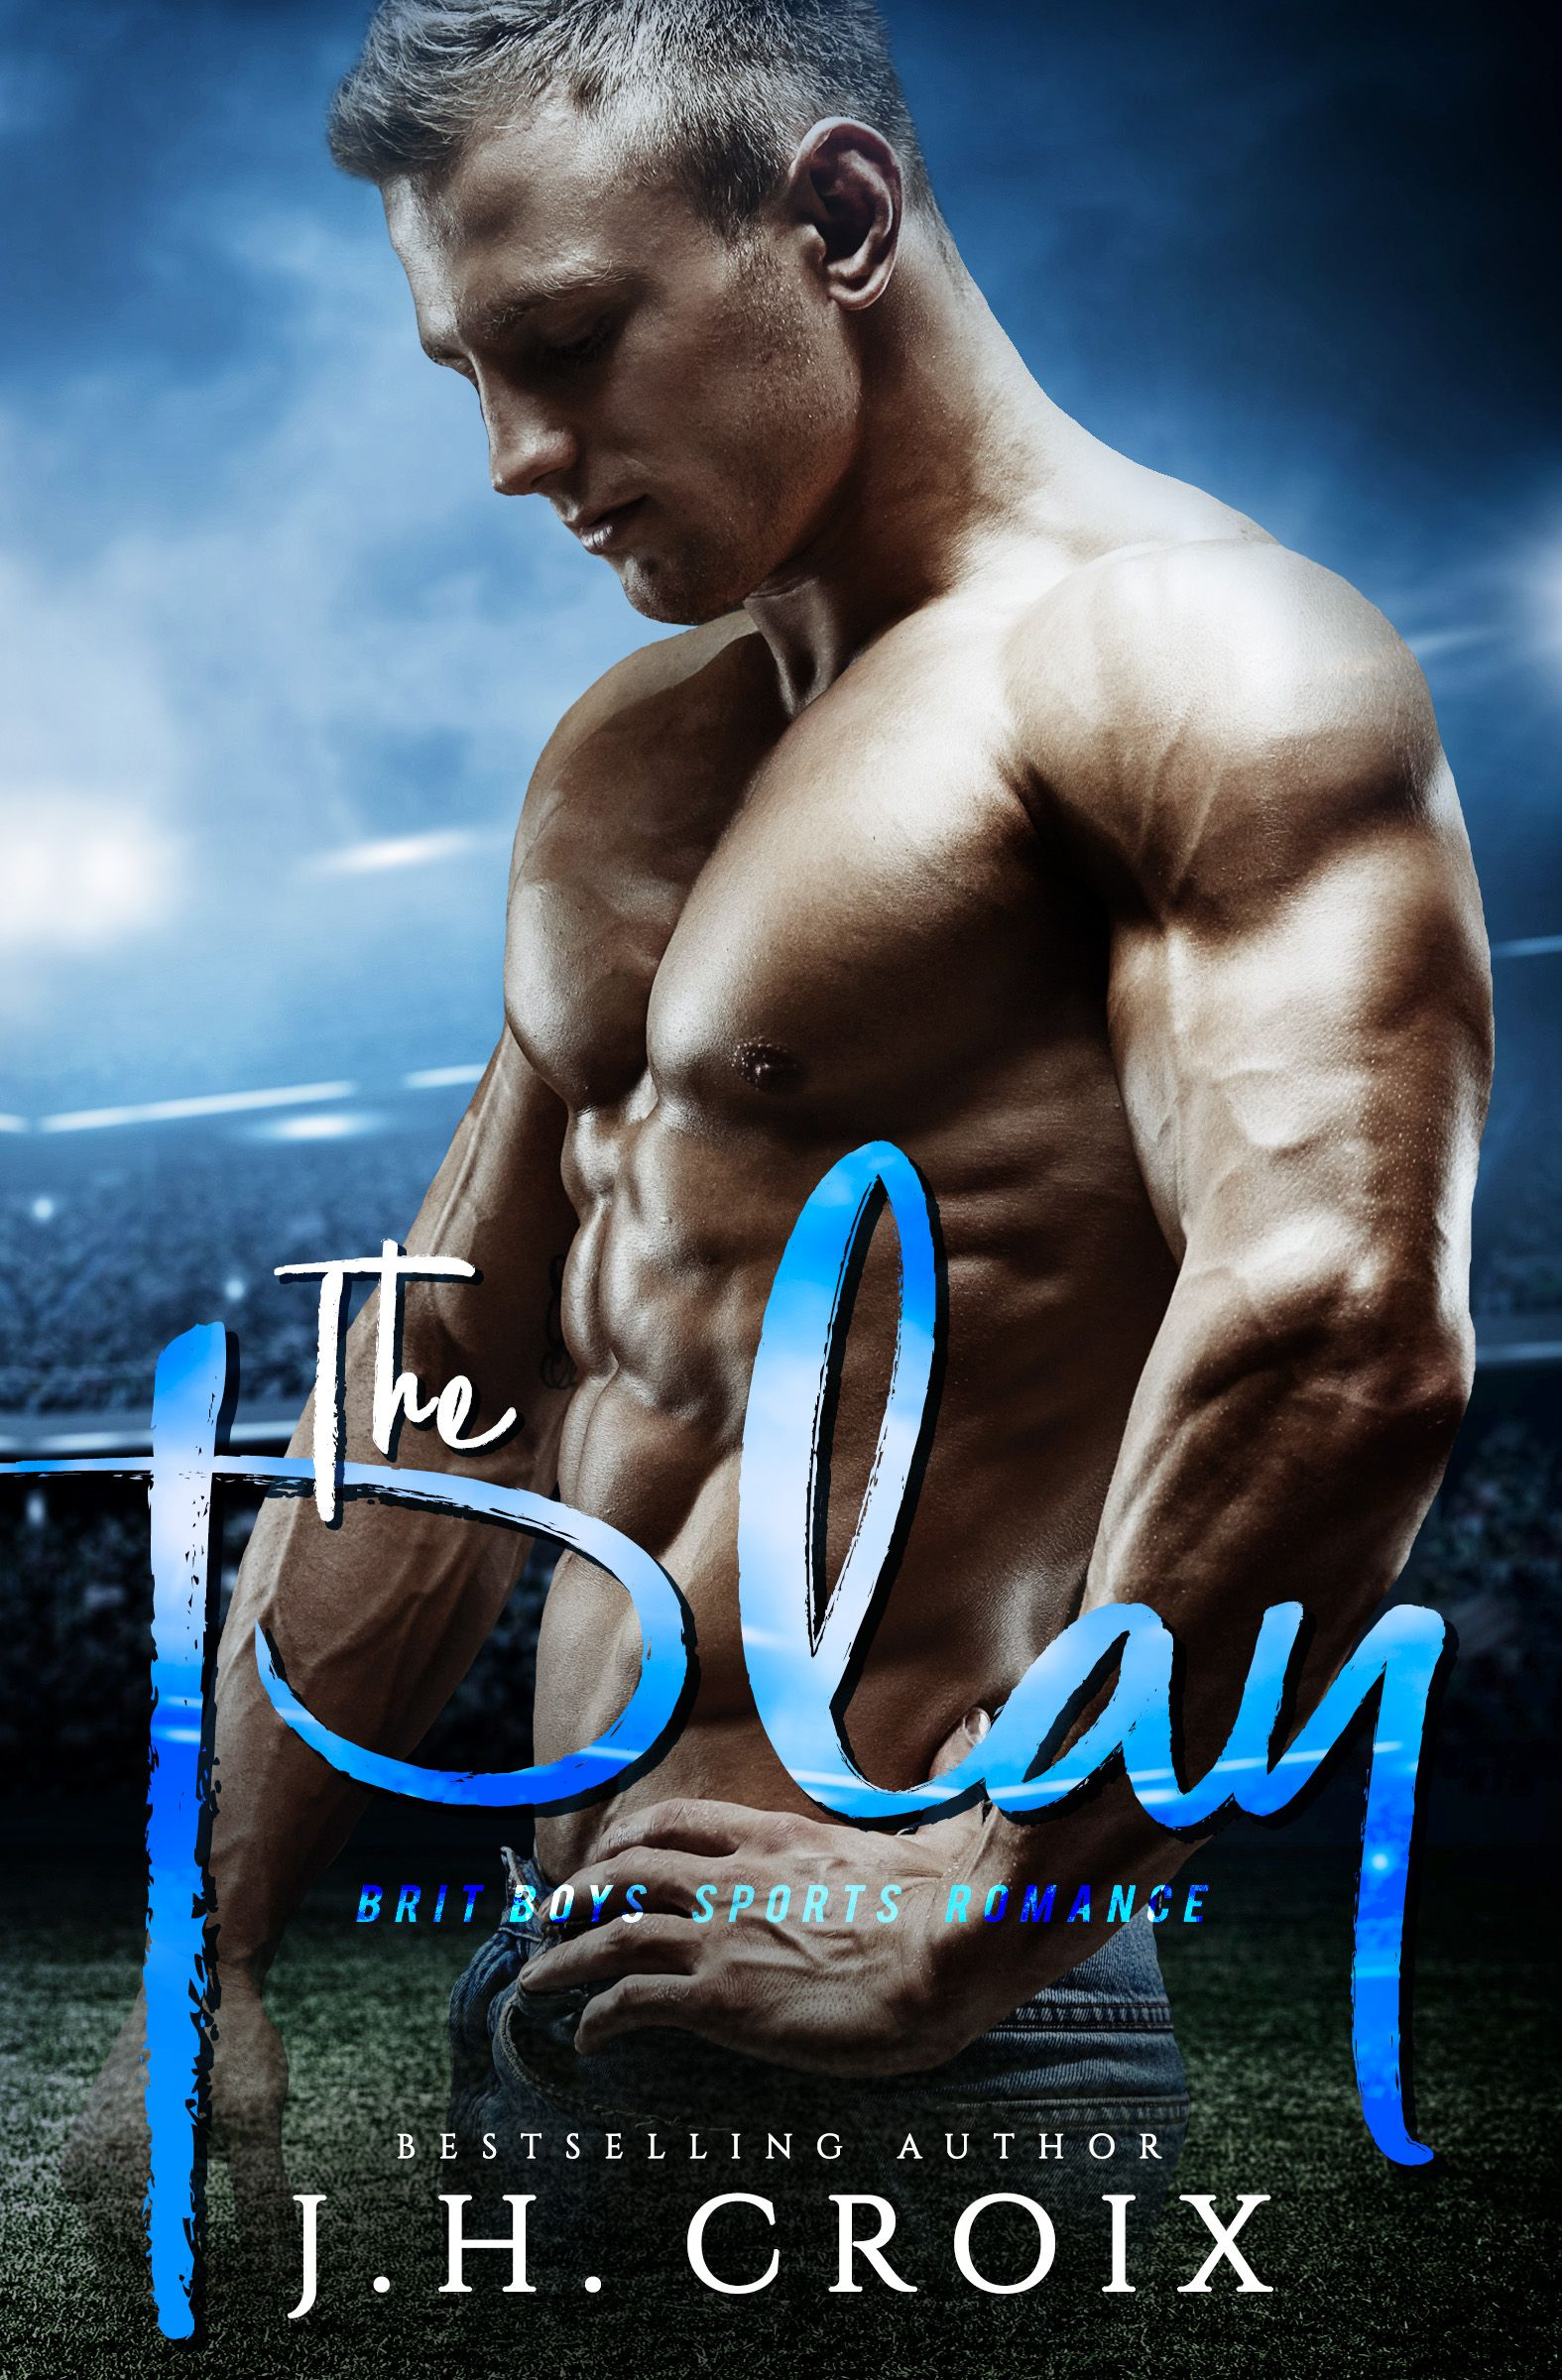 The Play, Sports Romance by J.H. Croix Free romance